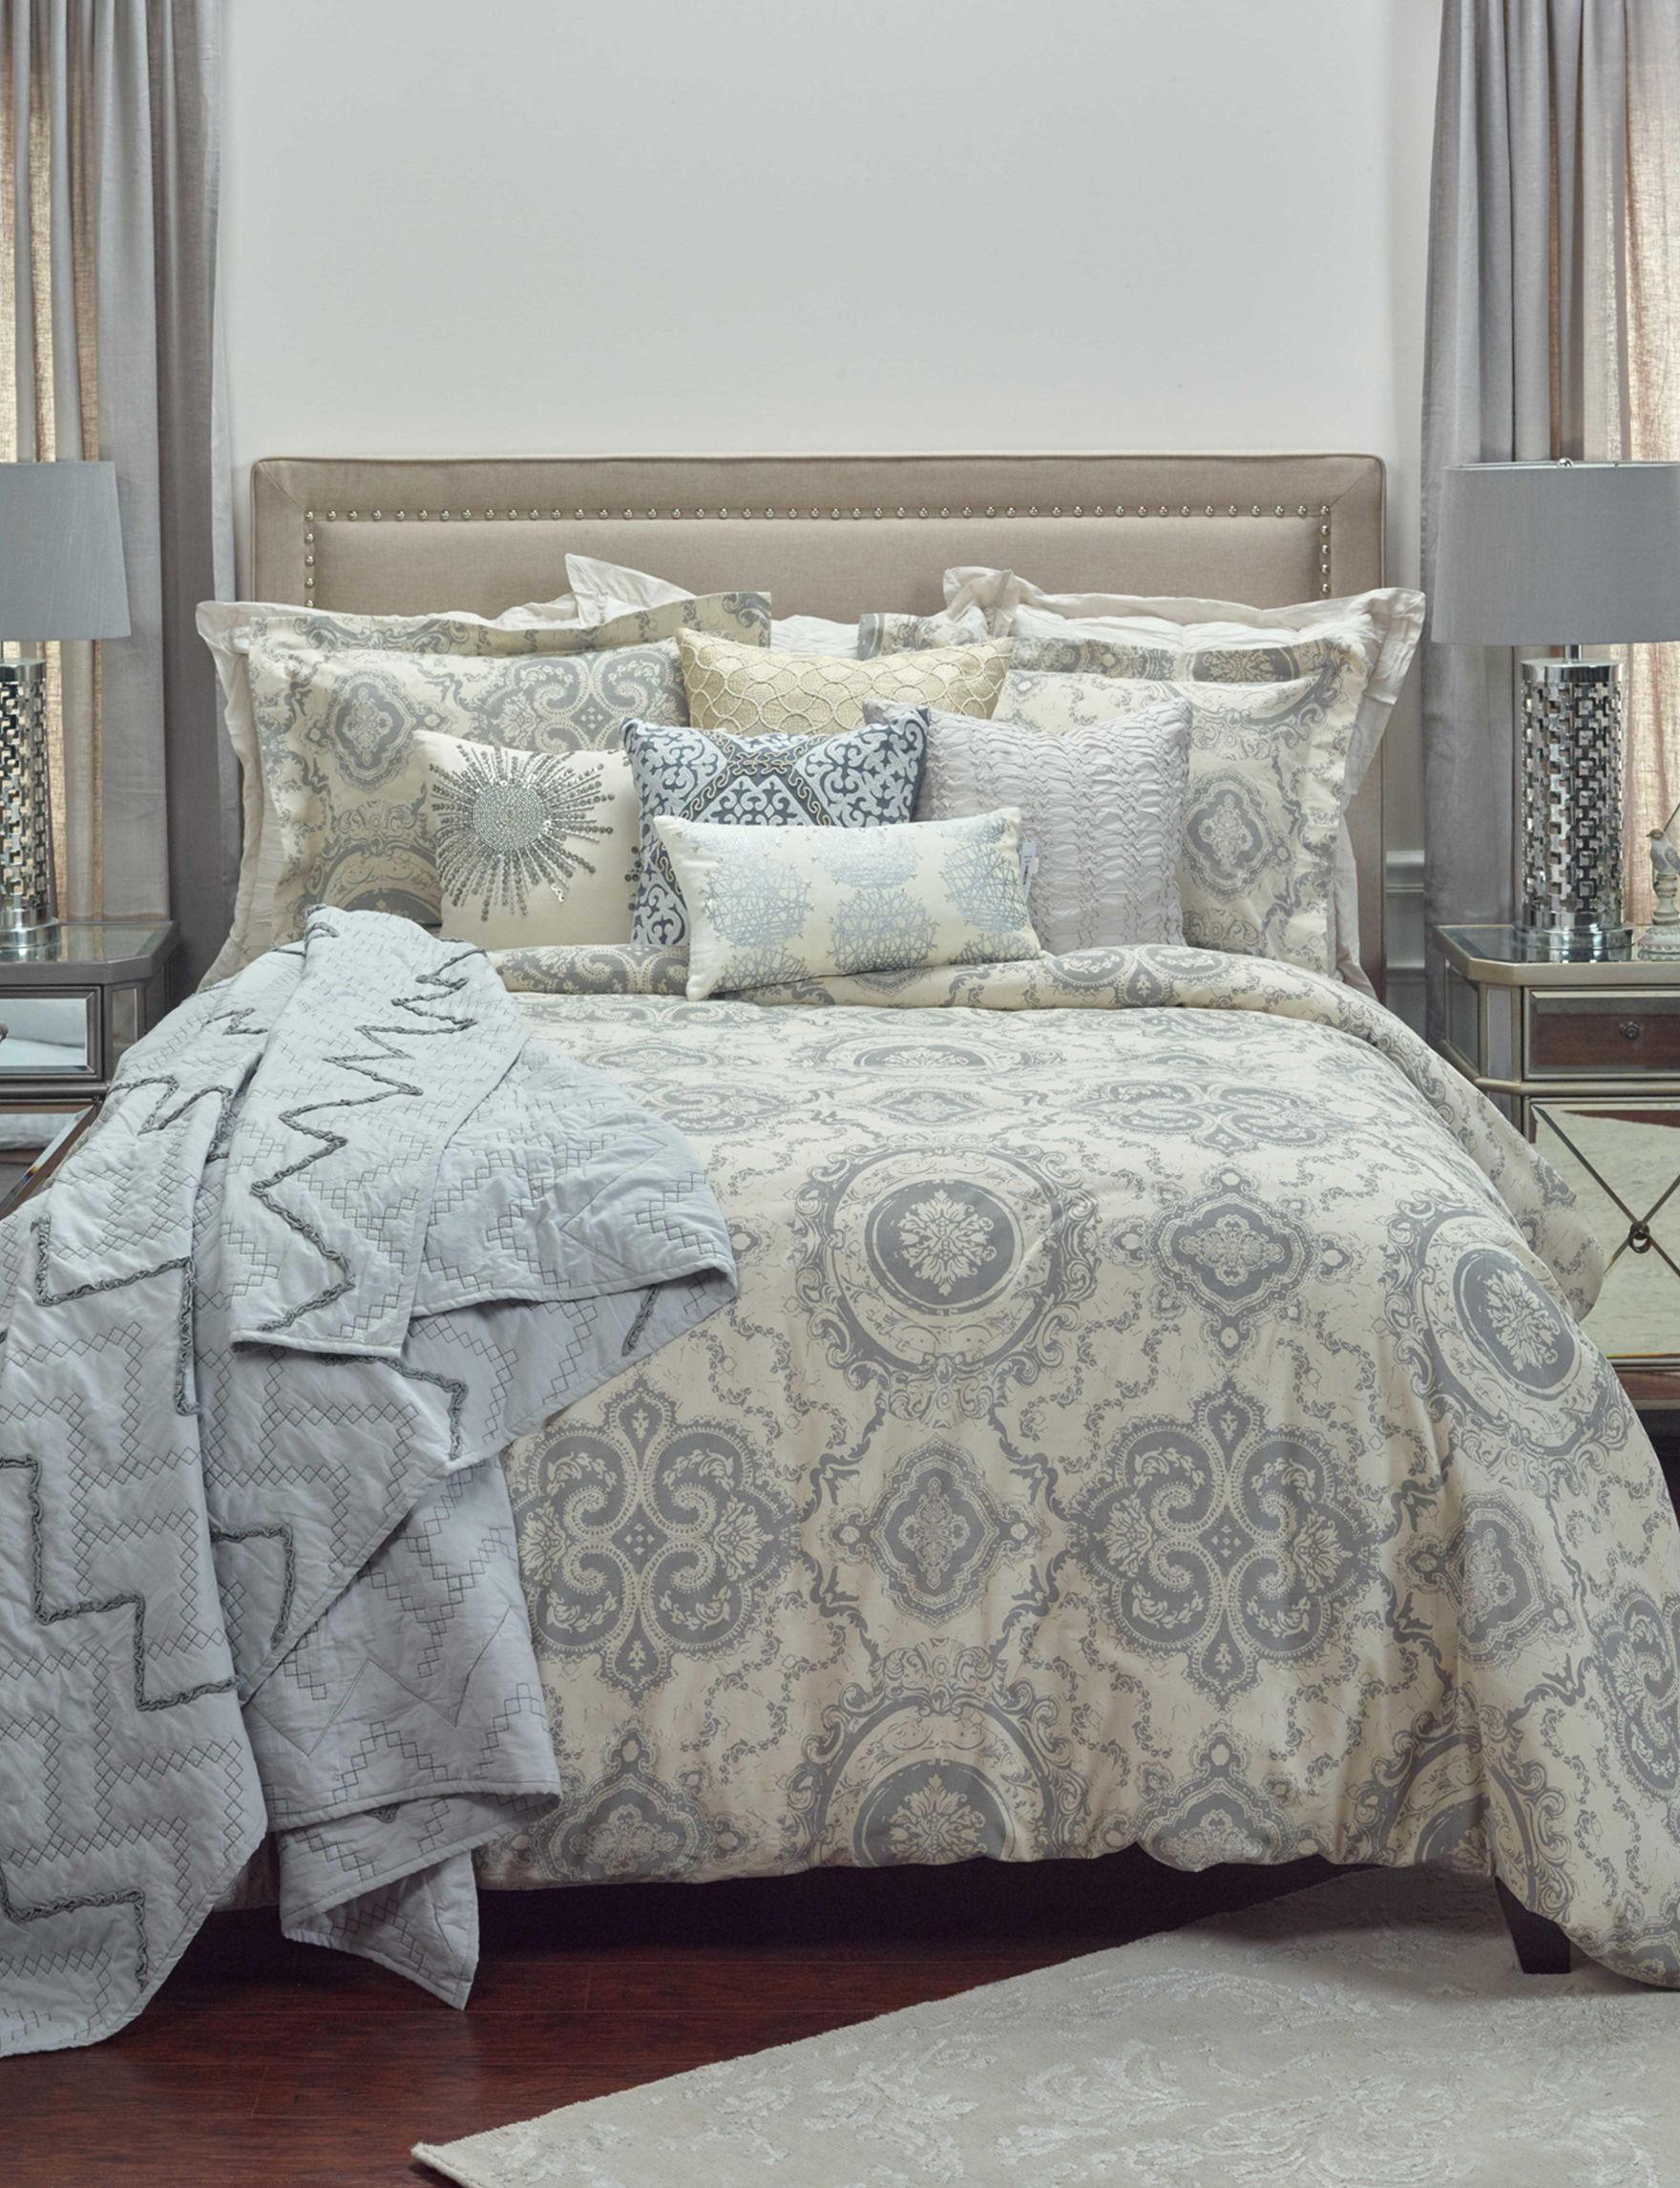 Rizzy Home Khaki Duvets & Duvet Sets